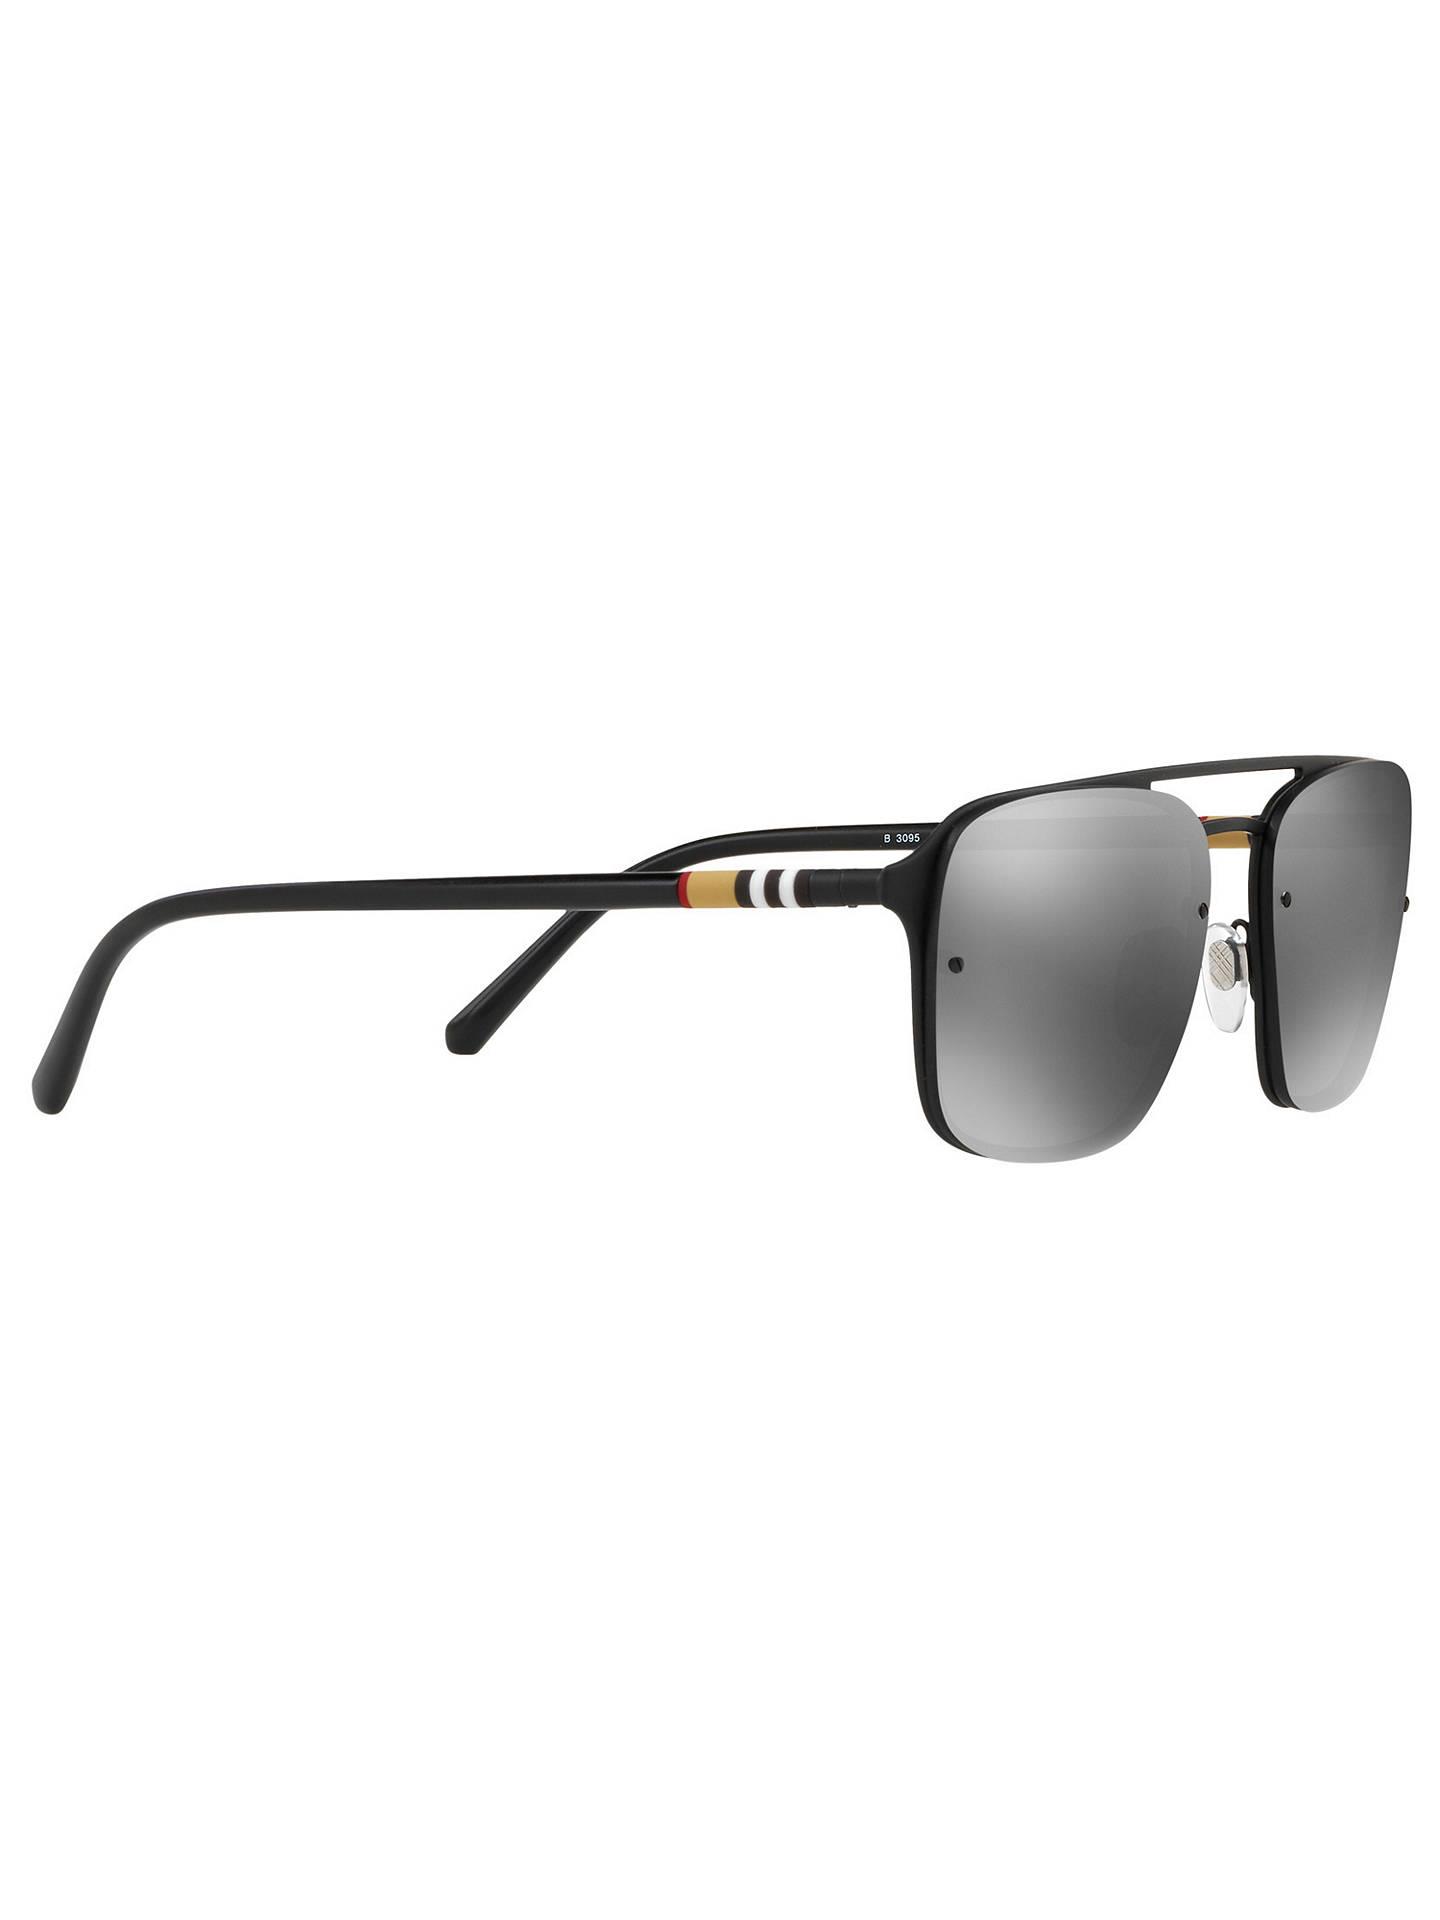 96e6684c4b20 ... Buy Burberry BE3095 Men's Square Sunglasses, Black/Mirror Grey Online  at johnlewis.com